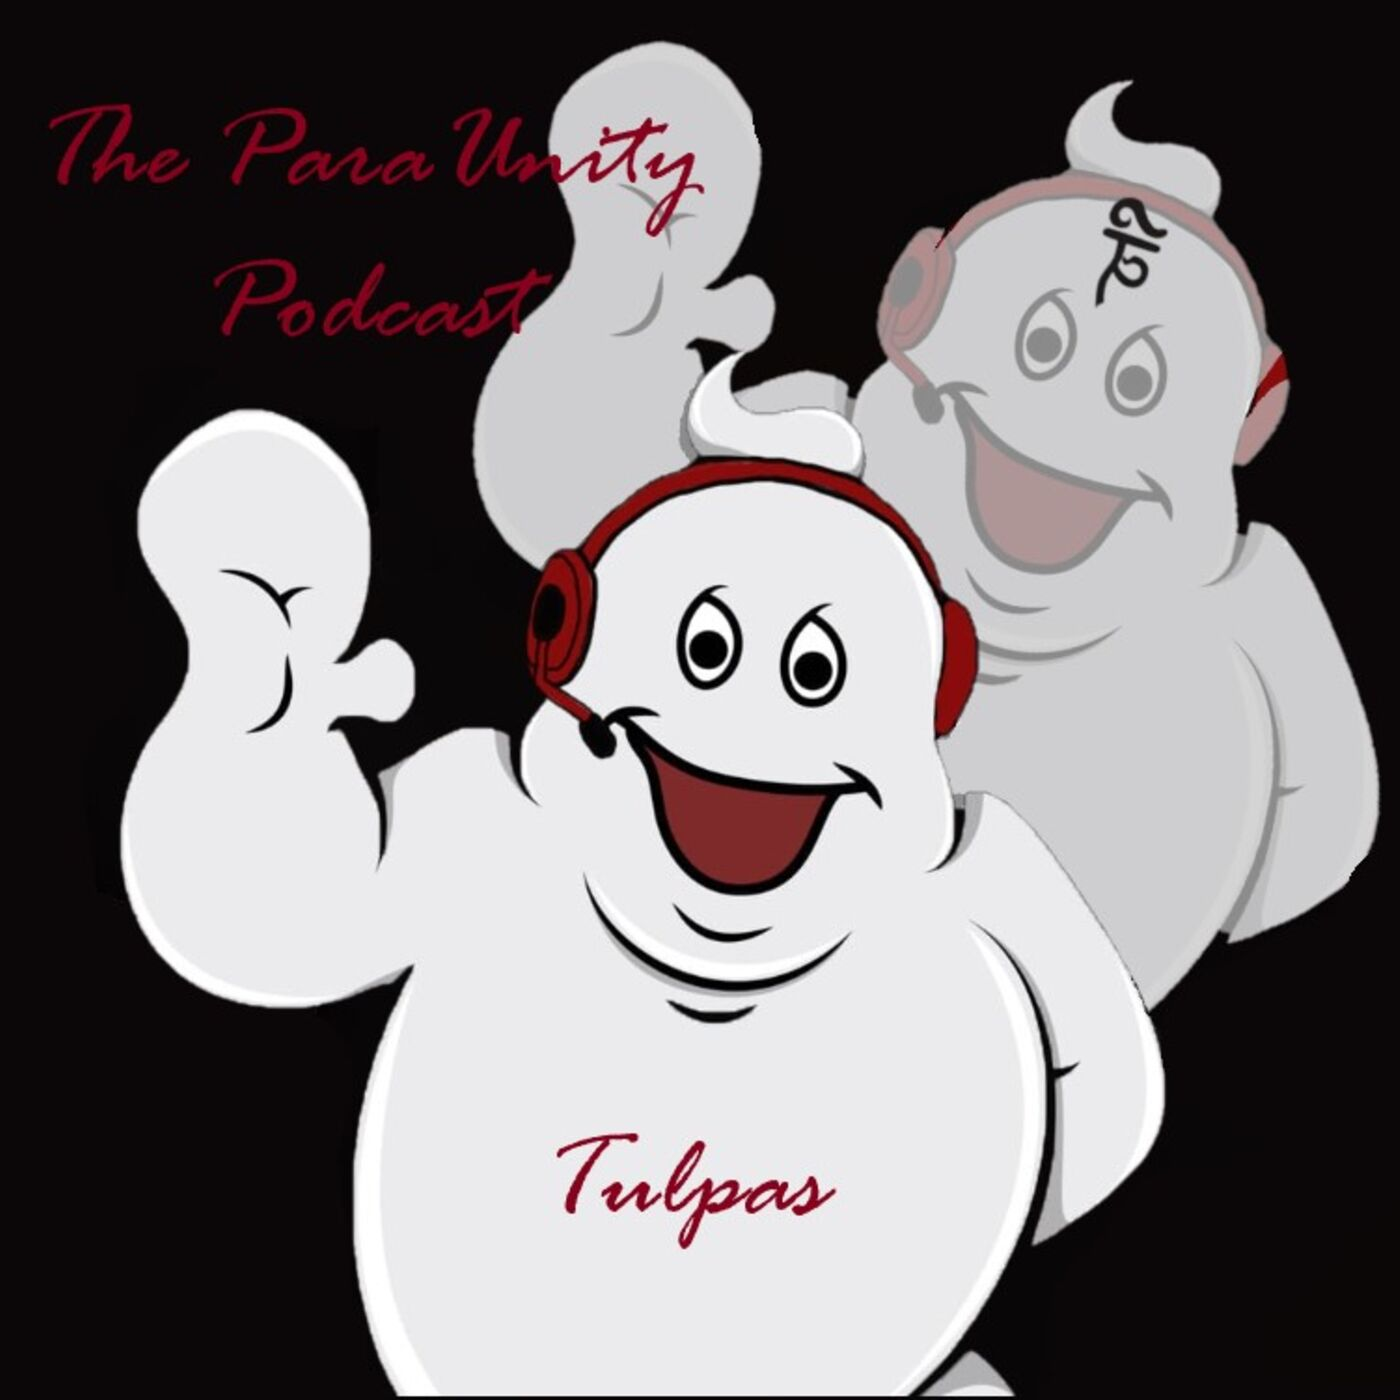 Episode 29 - Tulpas